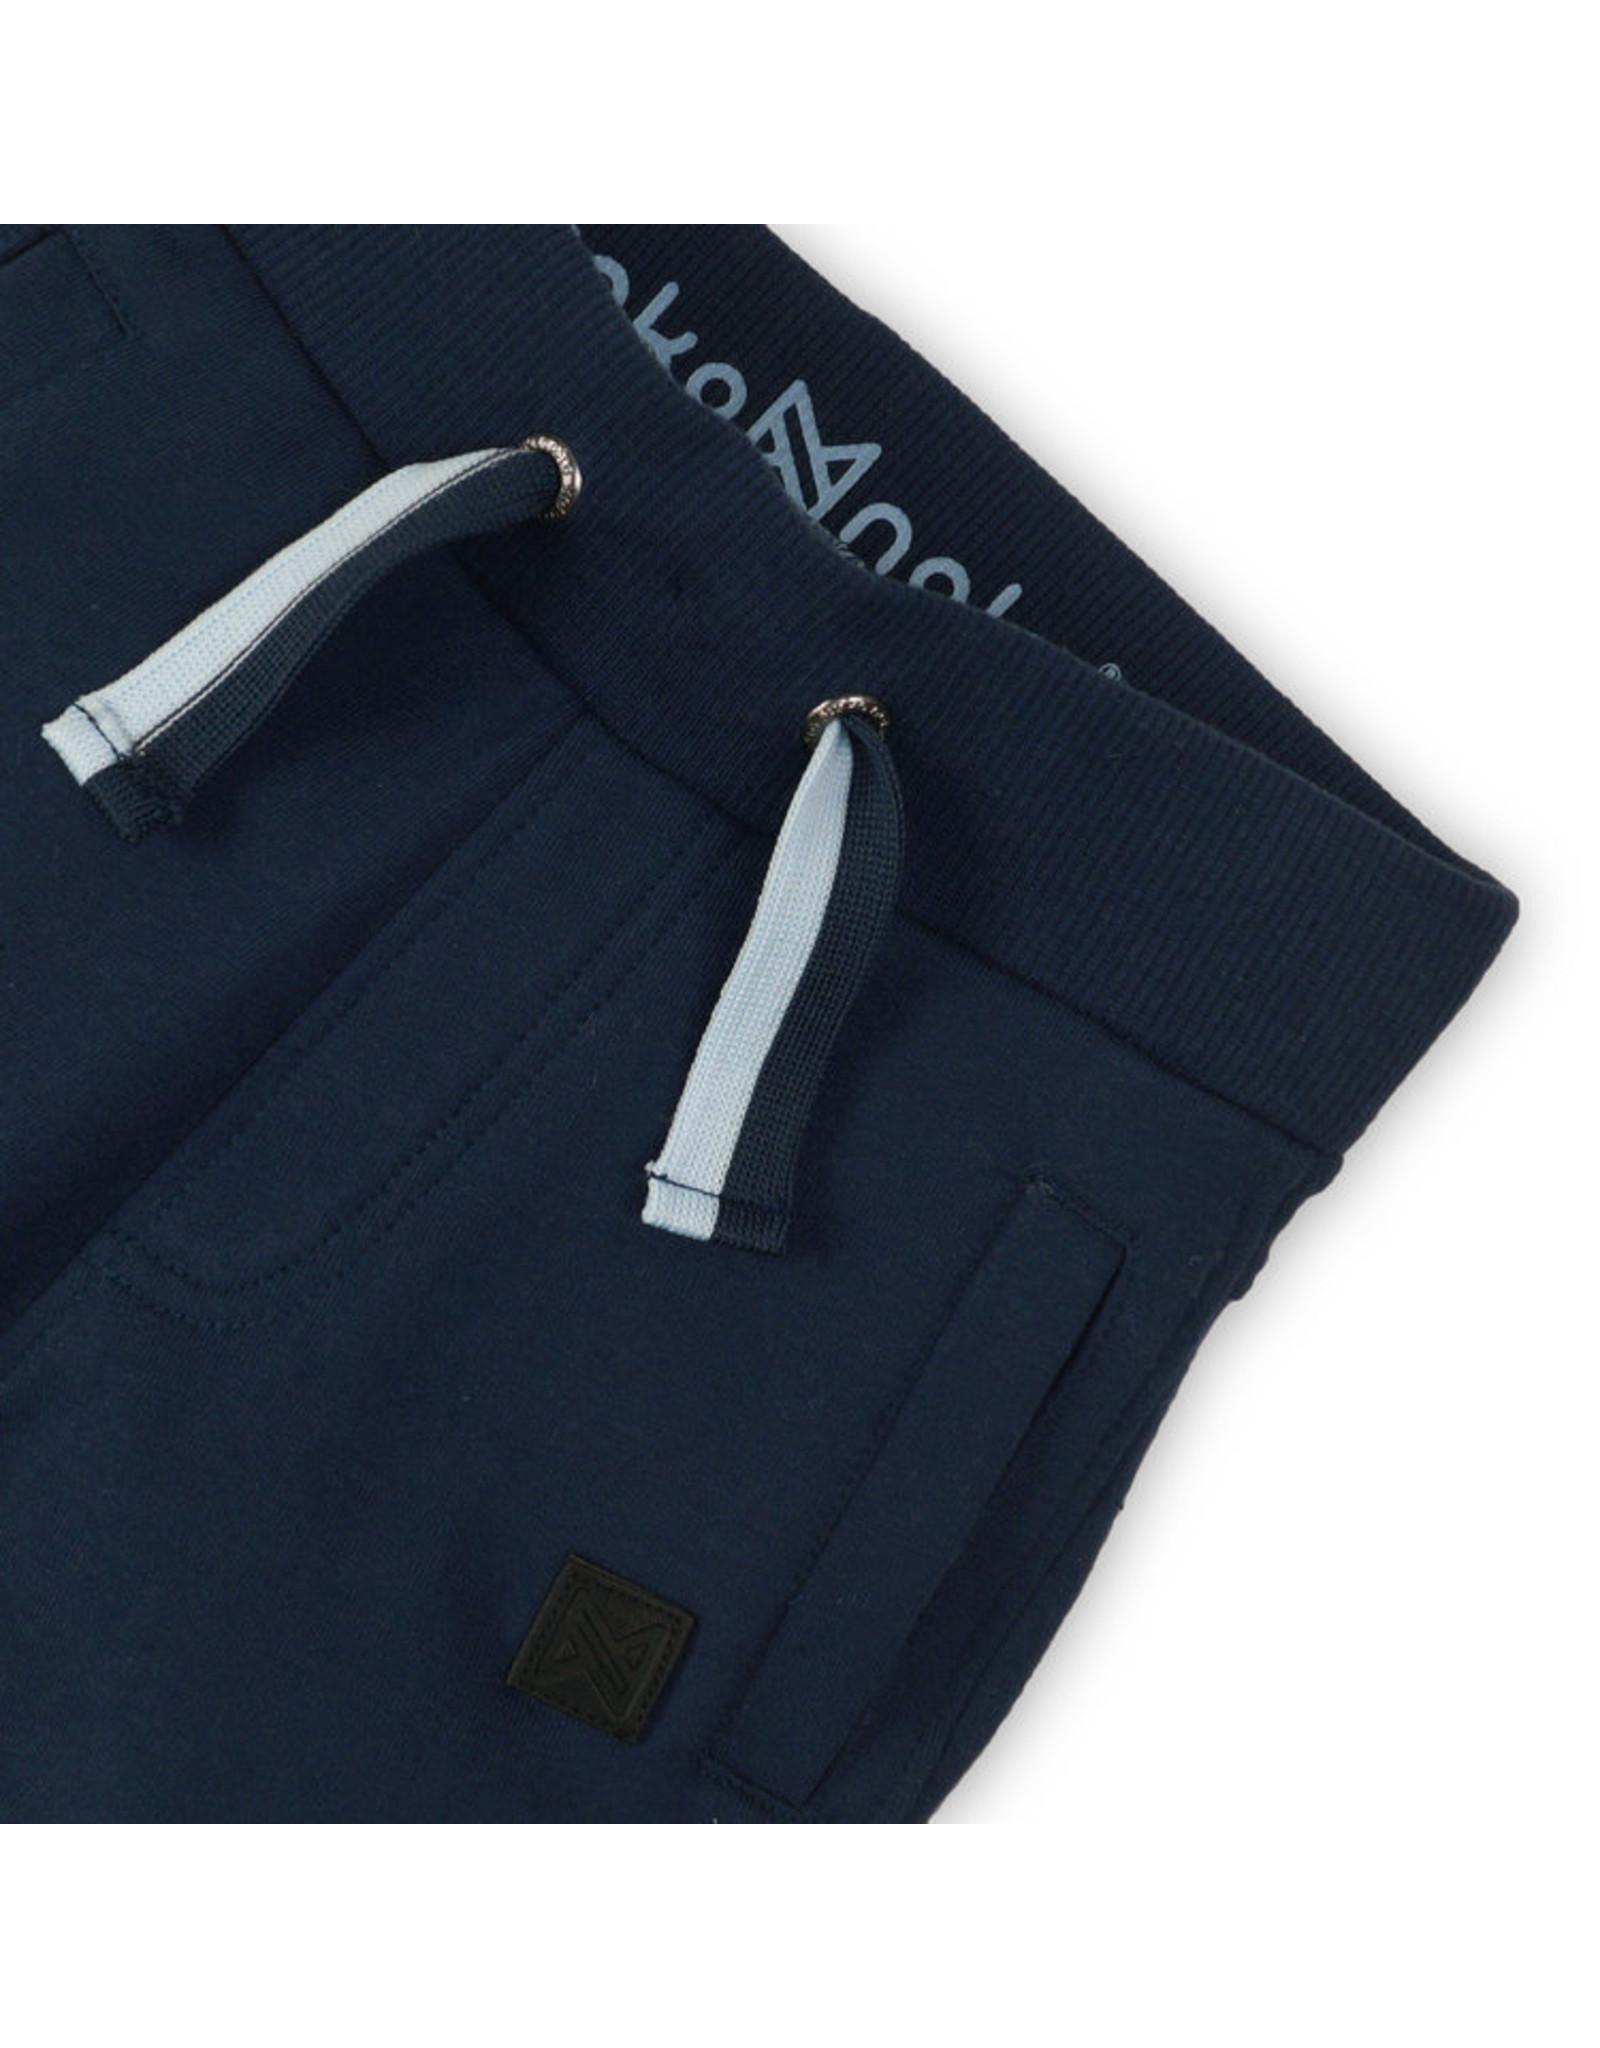 Koko Noko jogging shorts, Navy, 37C 34832